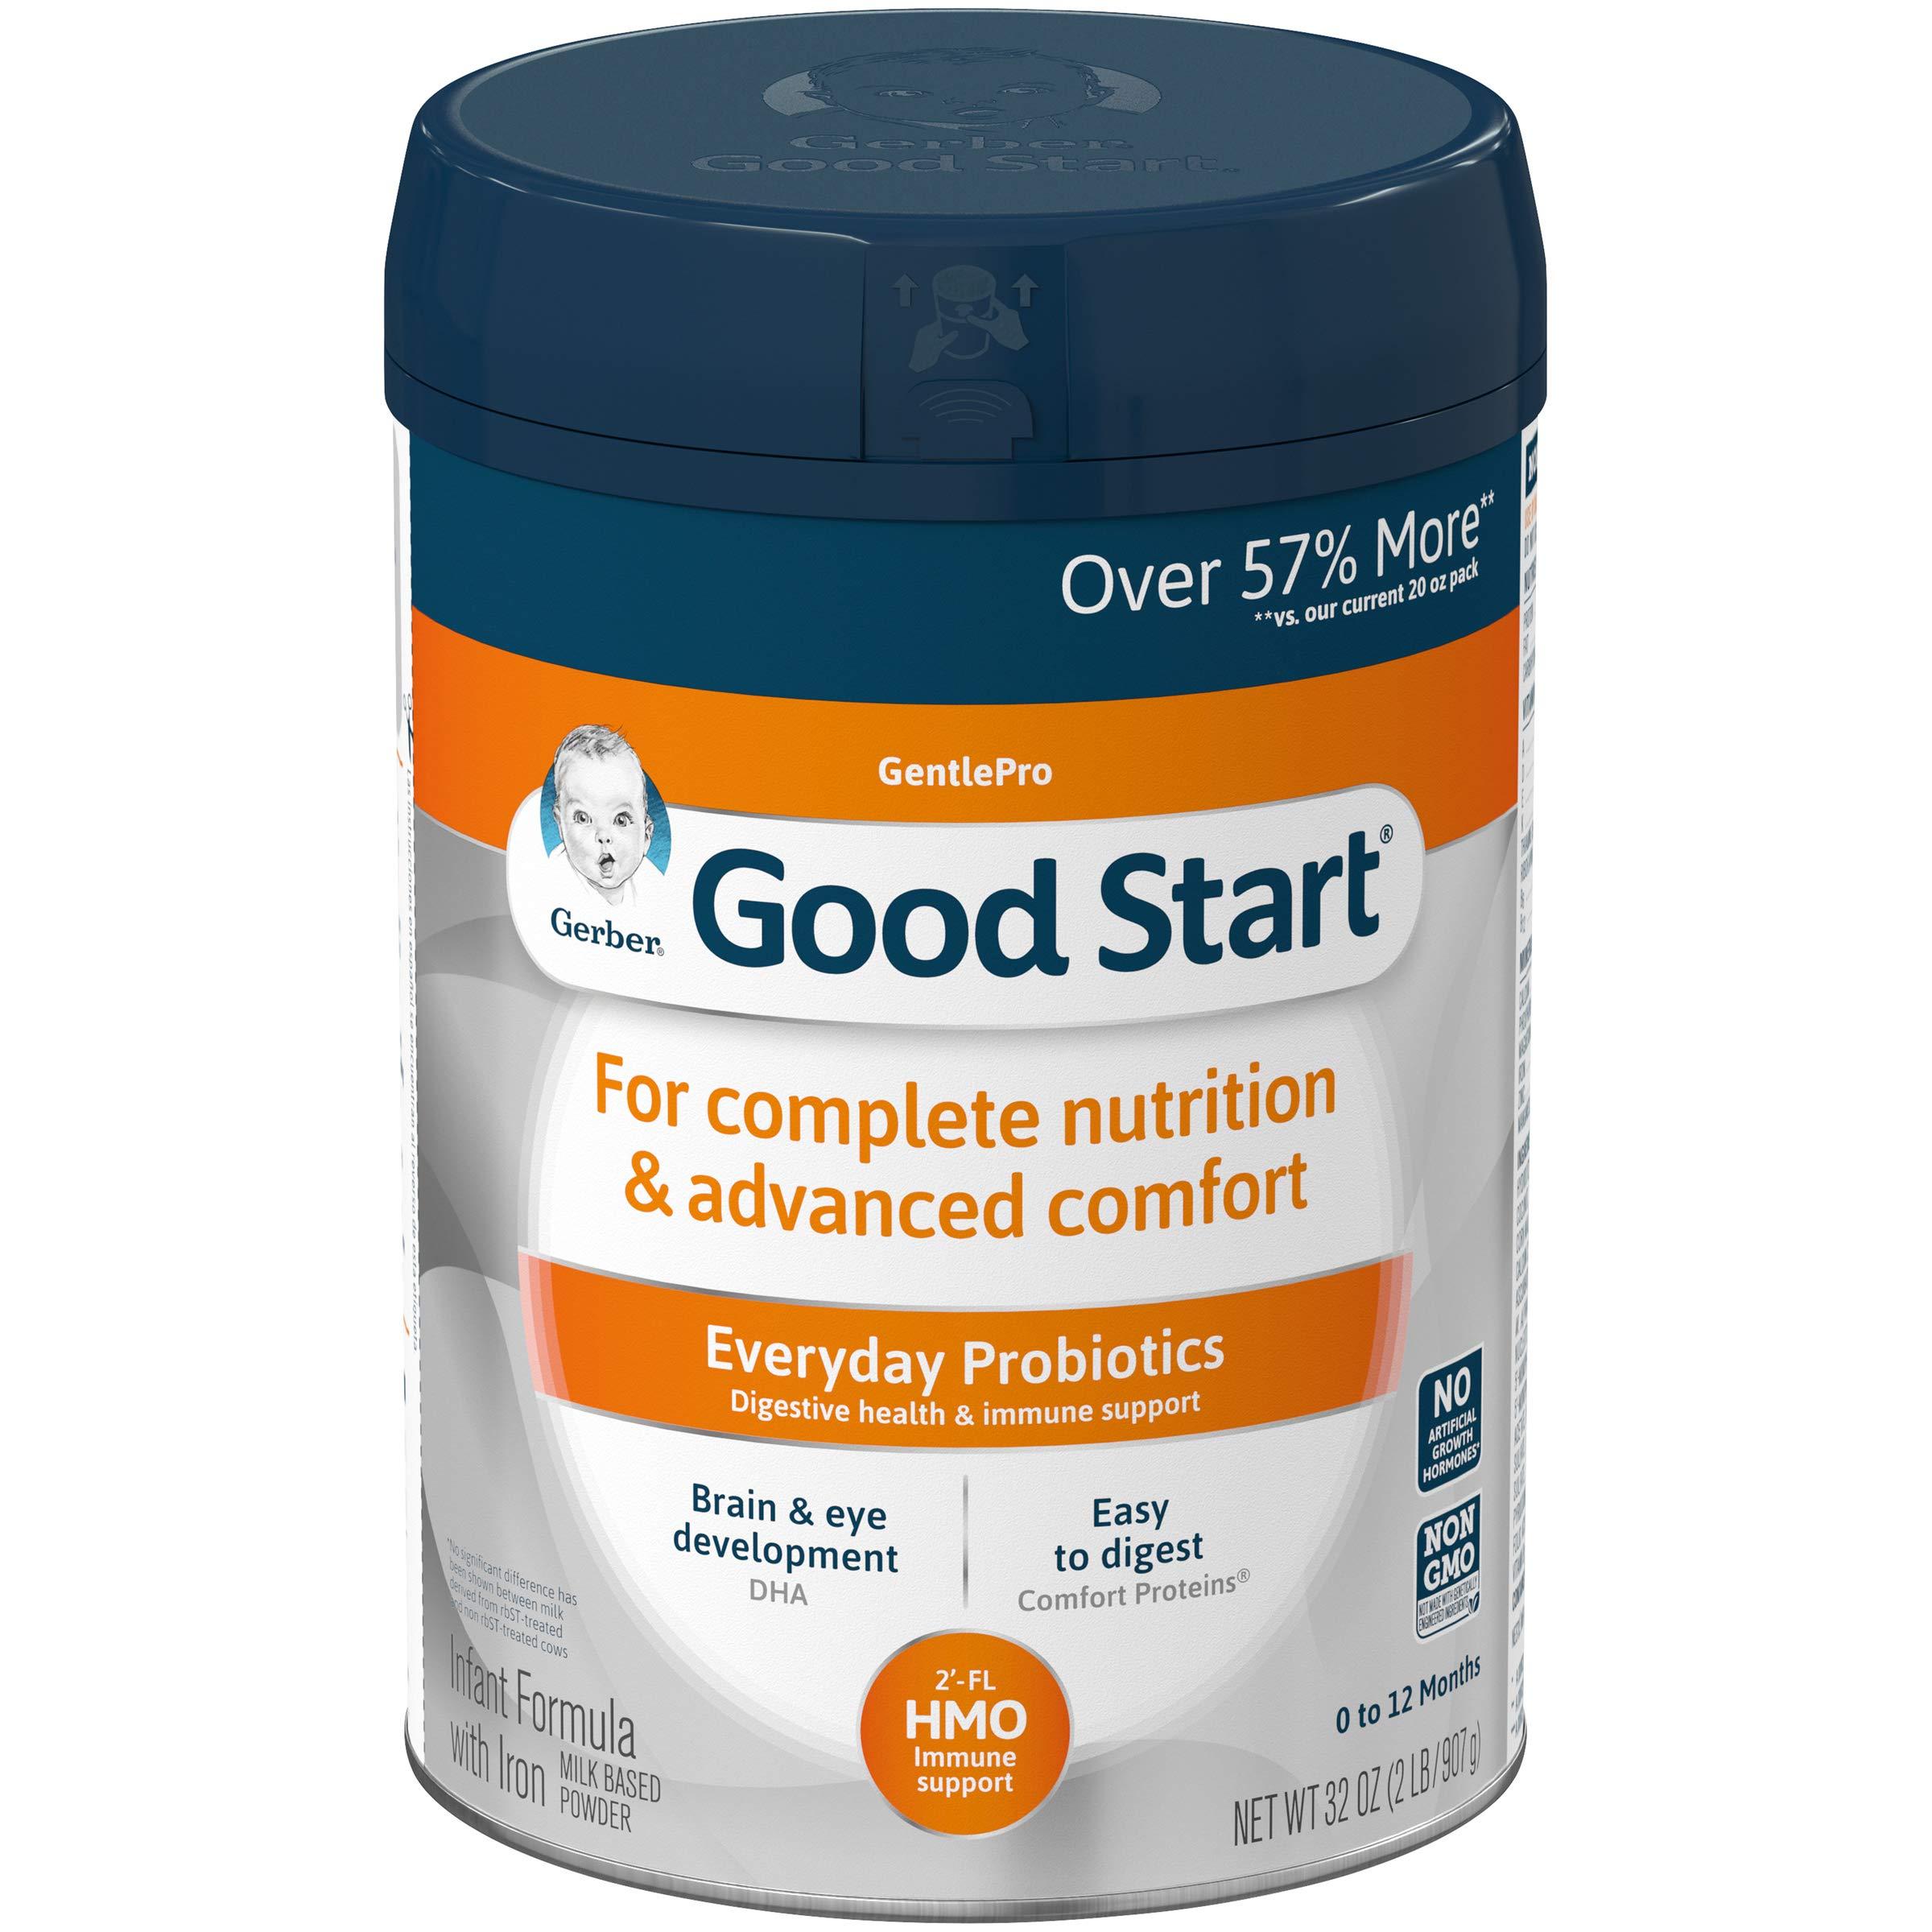 Gerber Good Start Gentle (HMO) Non-GMO Powder Infant Formula, Stage 1, 32 oz